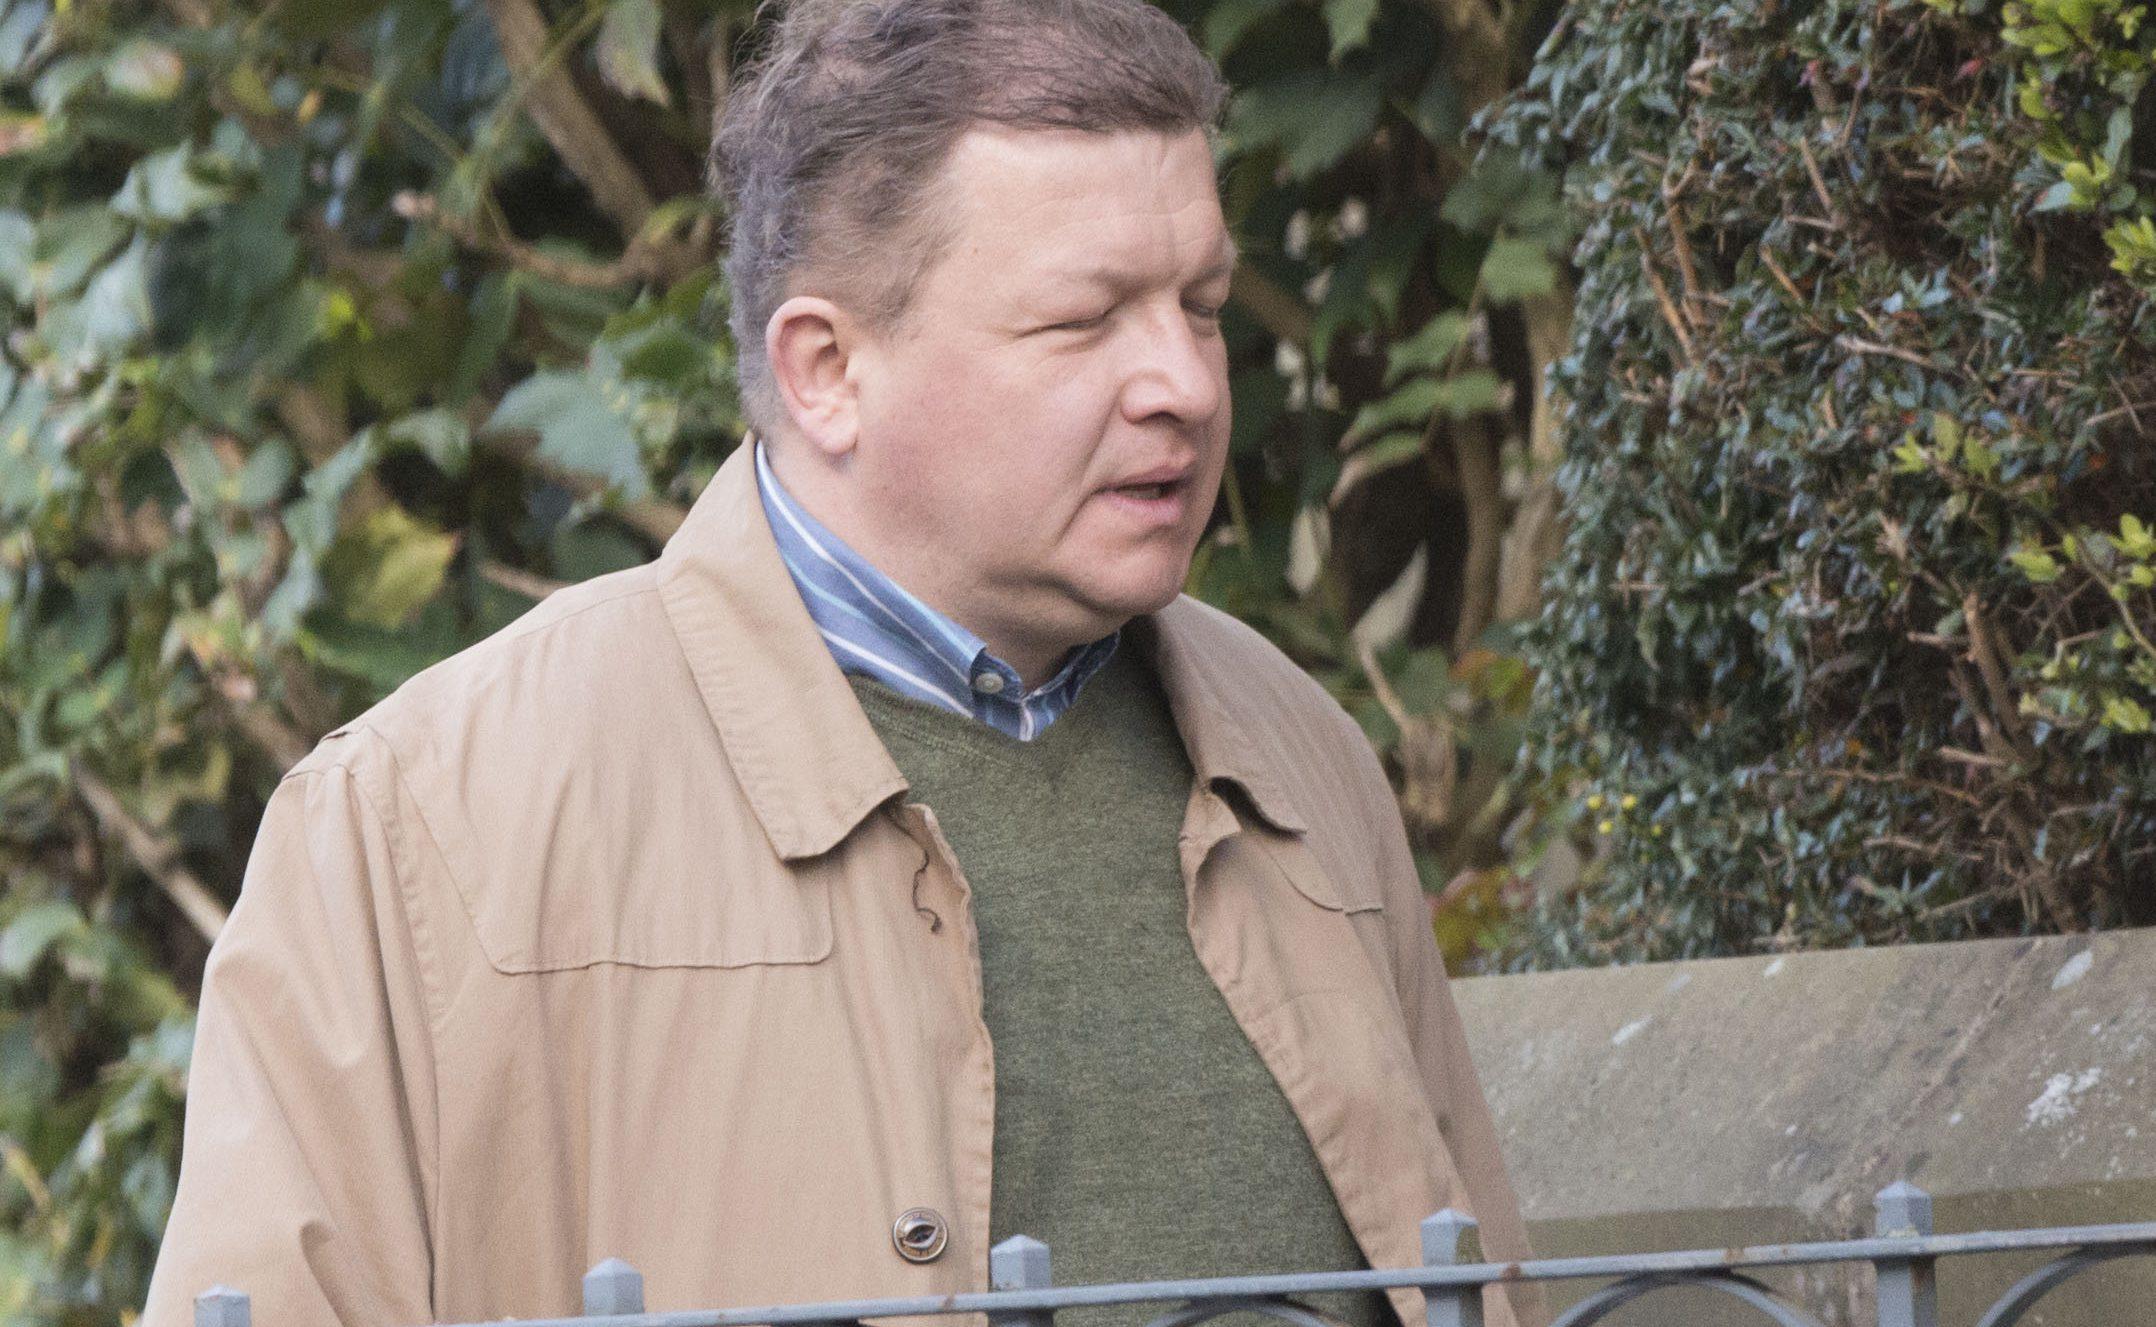 Thomas Wengierow at Dundee Court